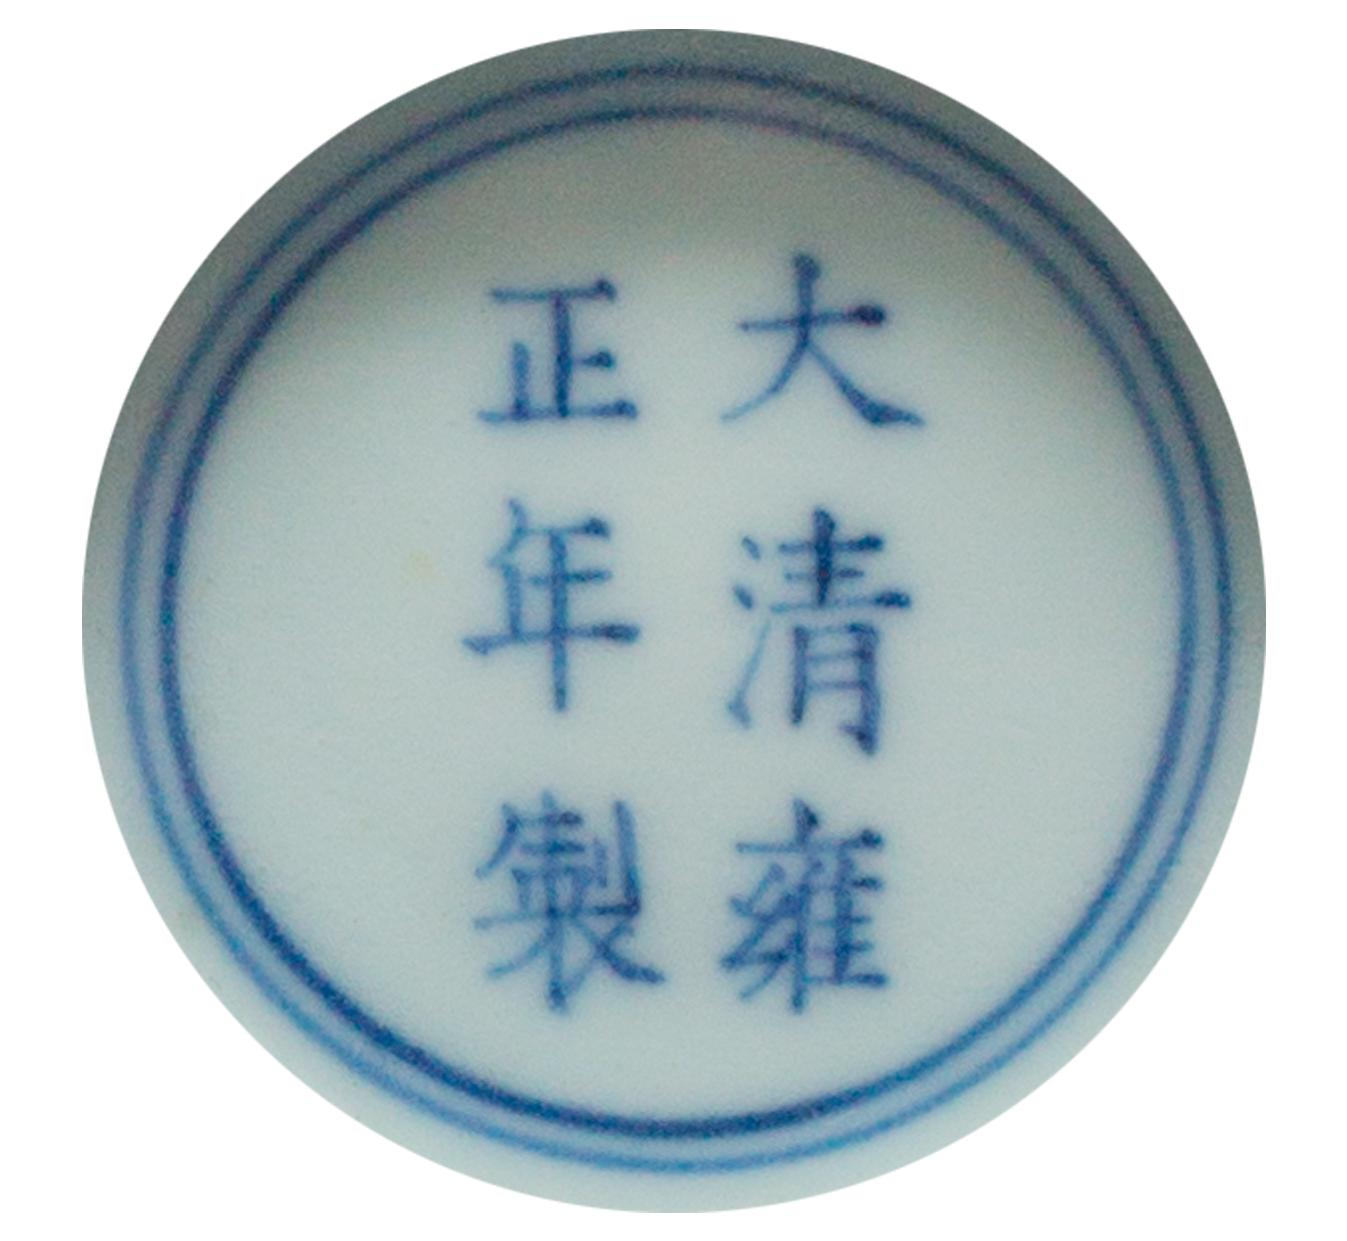 Lot 22 - A peach-bloom-glazed bowl, Qing Dynasty, Yongzheng six-character mark